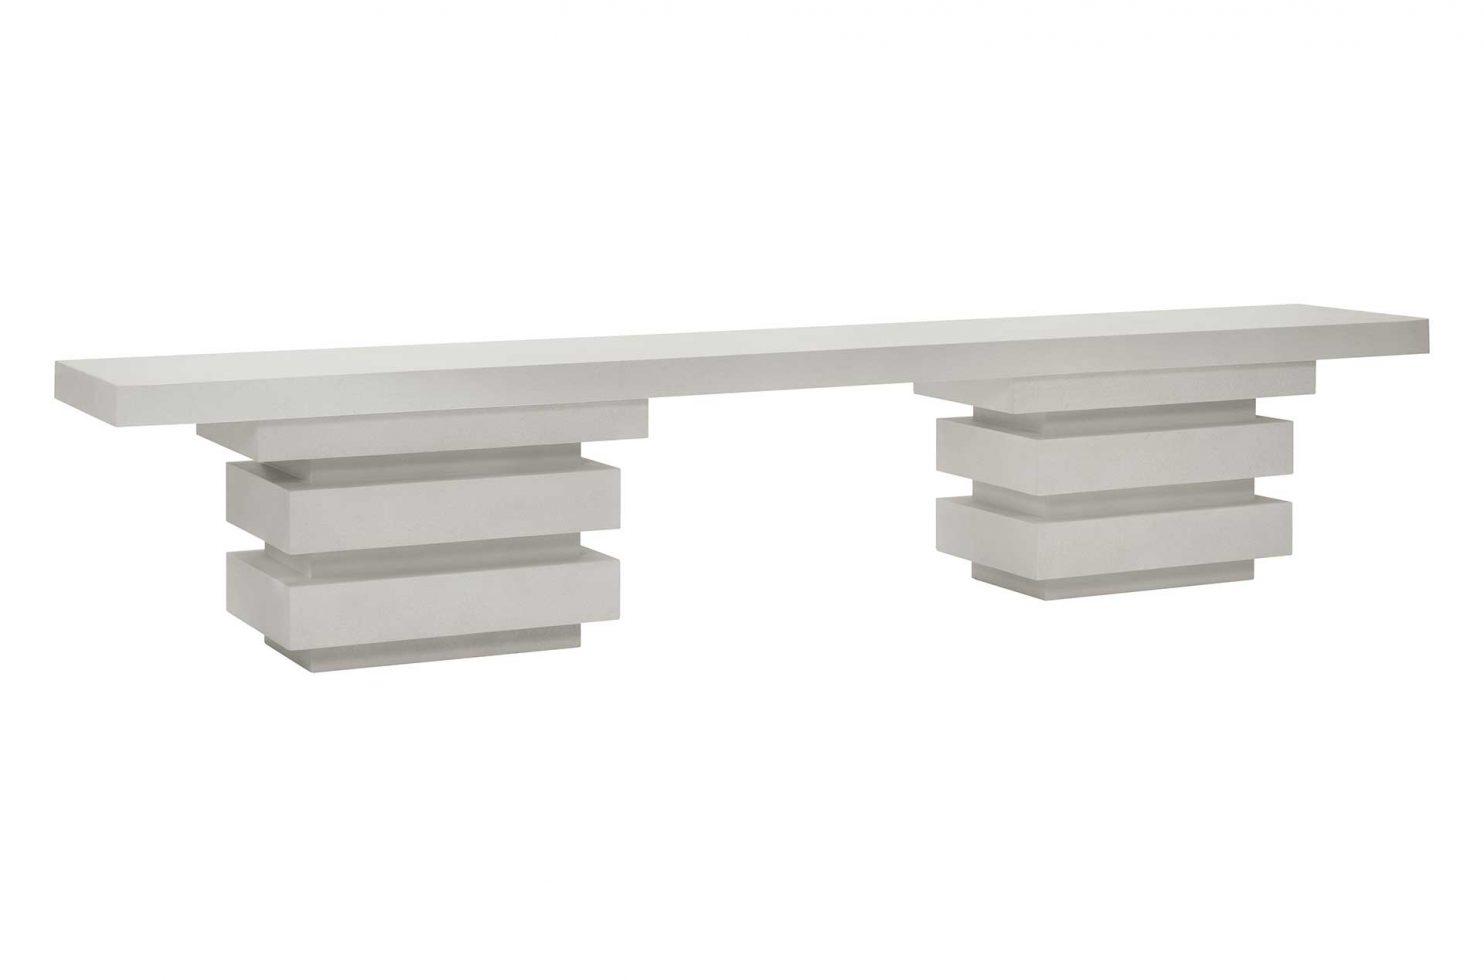 prov frp meditation rectangle bench S1568100215 1 3Q web